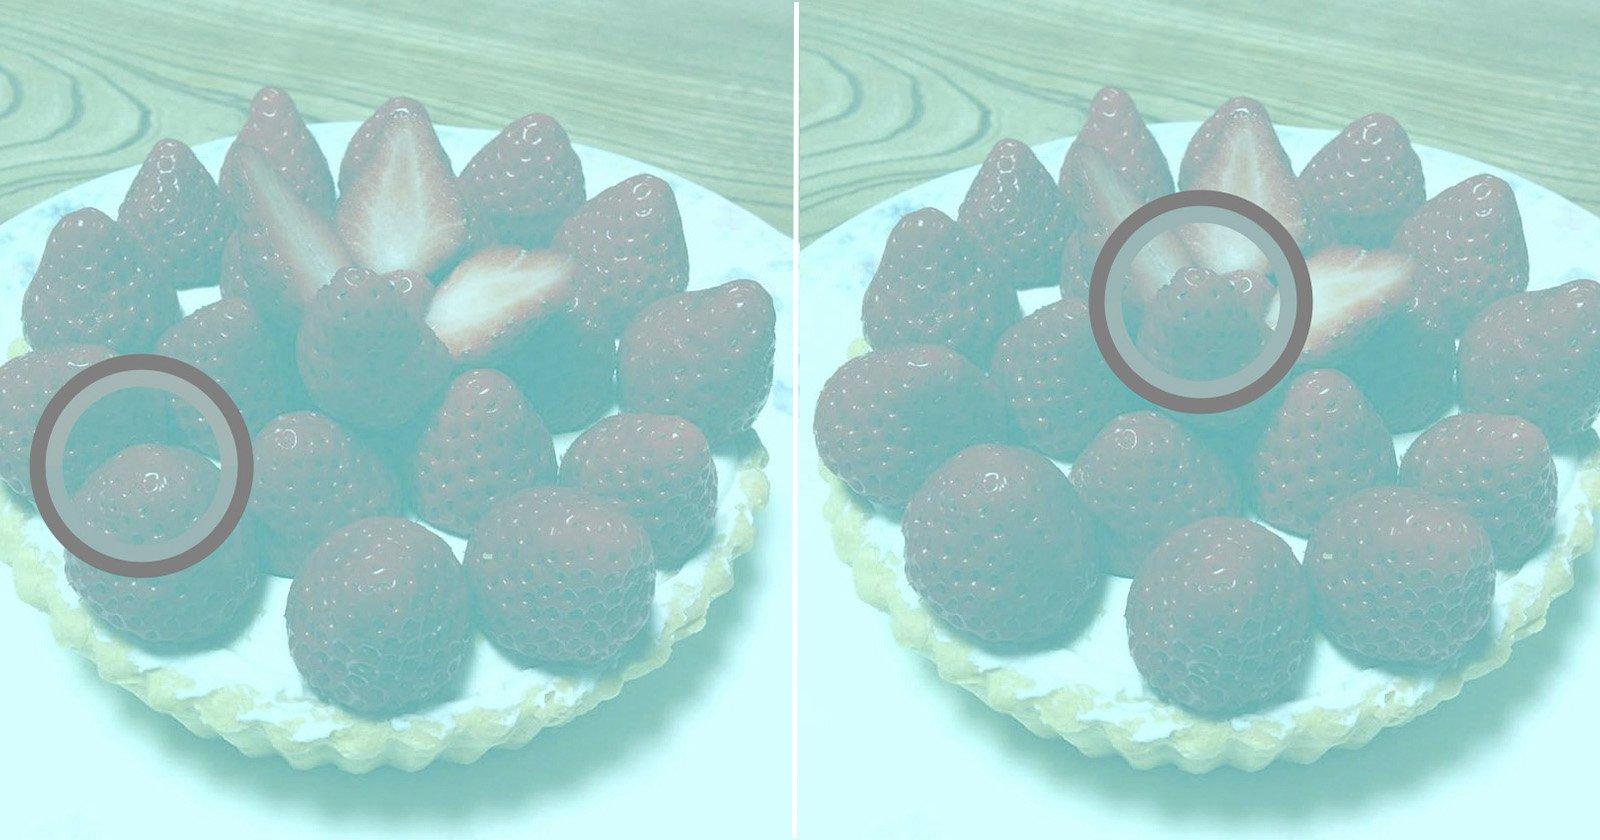 Questa foto NON ha pixel rossi: la color correction del cervello